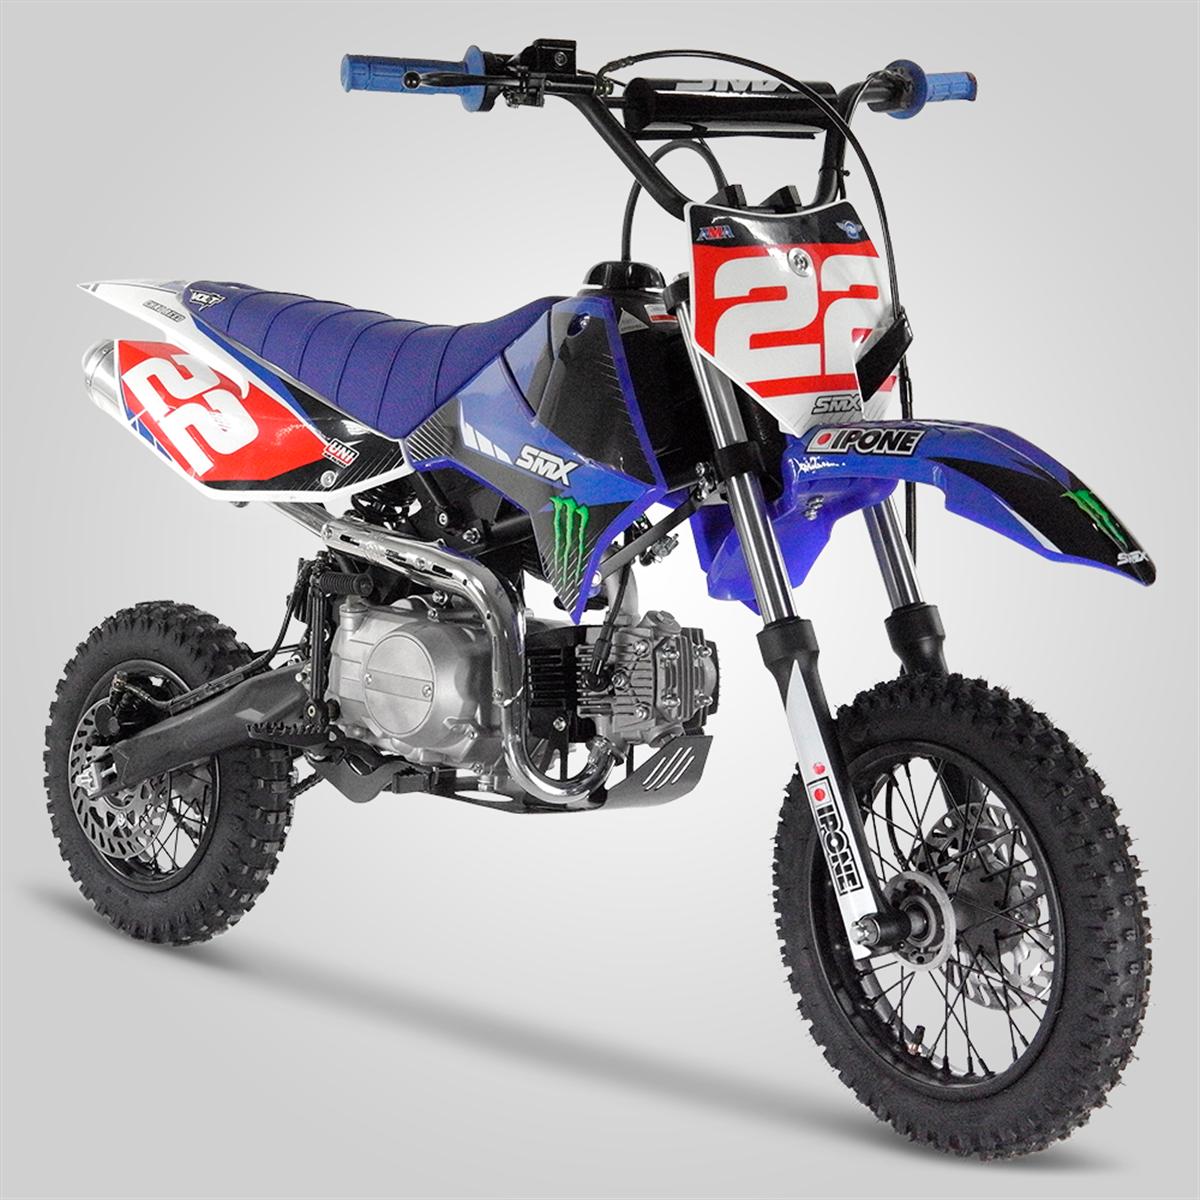 Dirt Bike LX Factory 110cc Pit Bike 12/14 Monster Energy